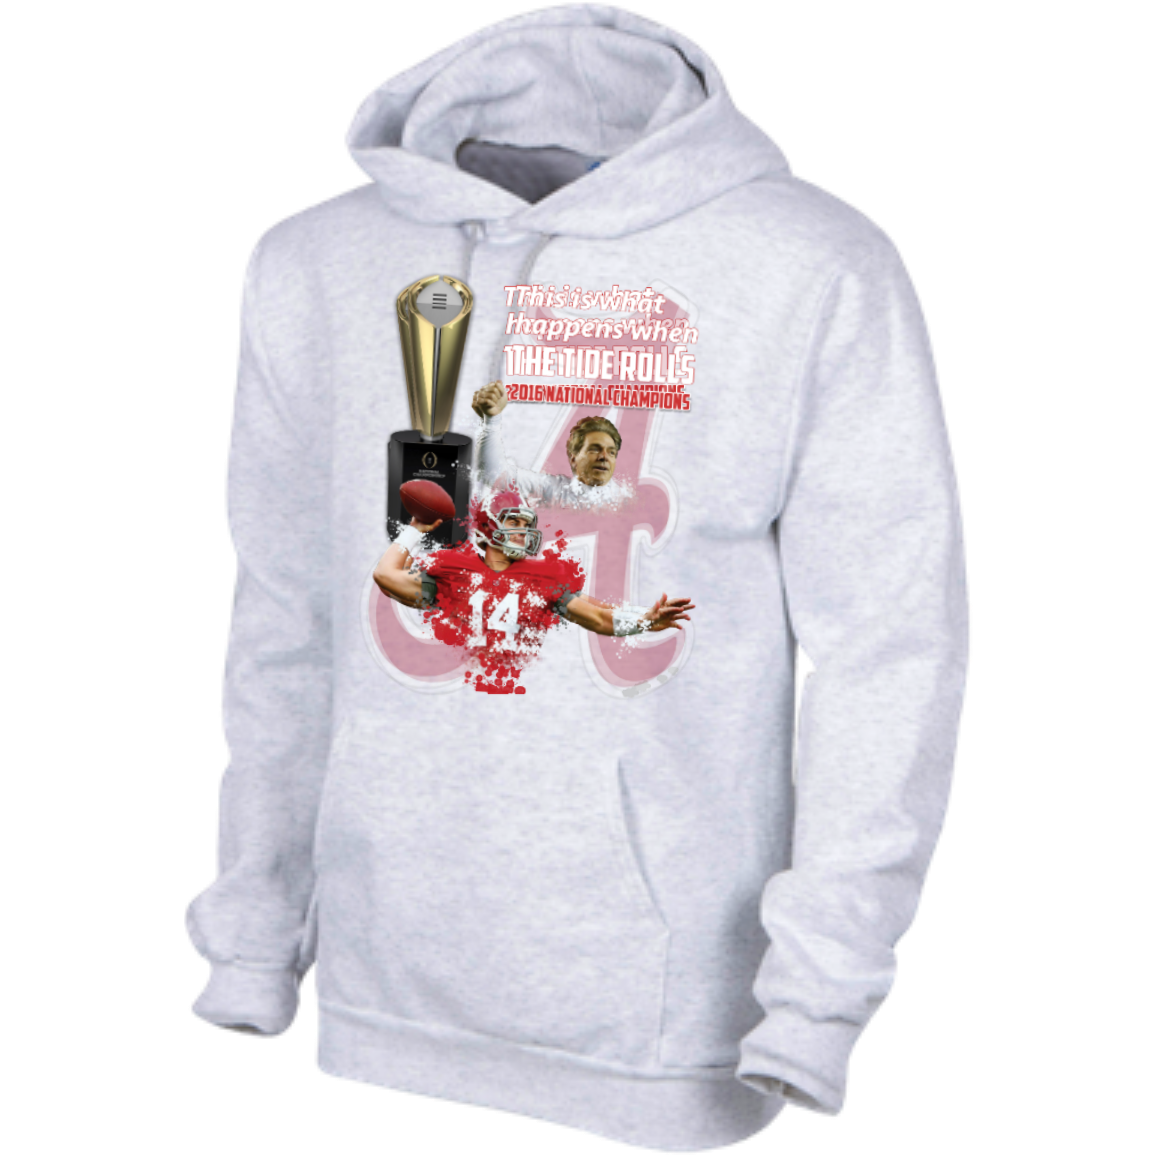 Alabama Crimson Tide 2016 National Champions Hooded Sweatshirt 9 5 Oz In 2021 Champion Hooded Sweatshirt Alabama Crimson Tide Crimson Tide [ 1155 x 1155 Pixel ]